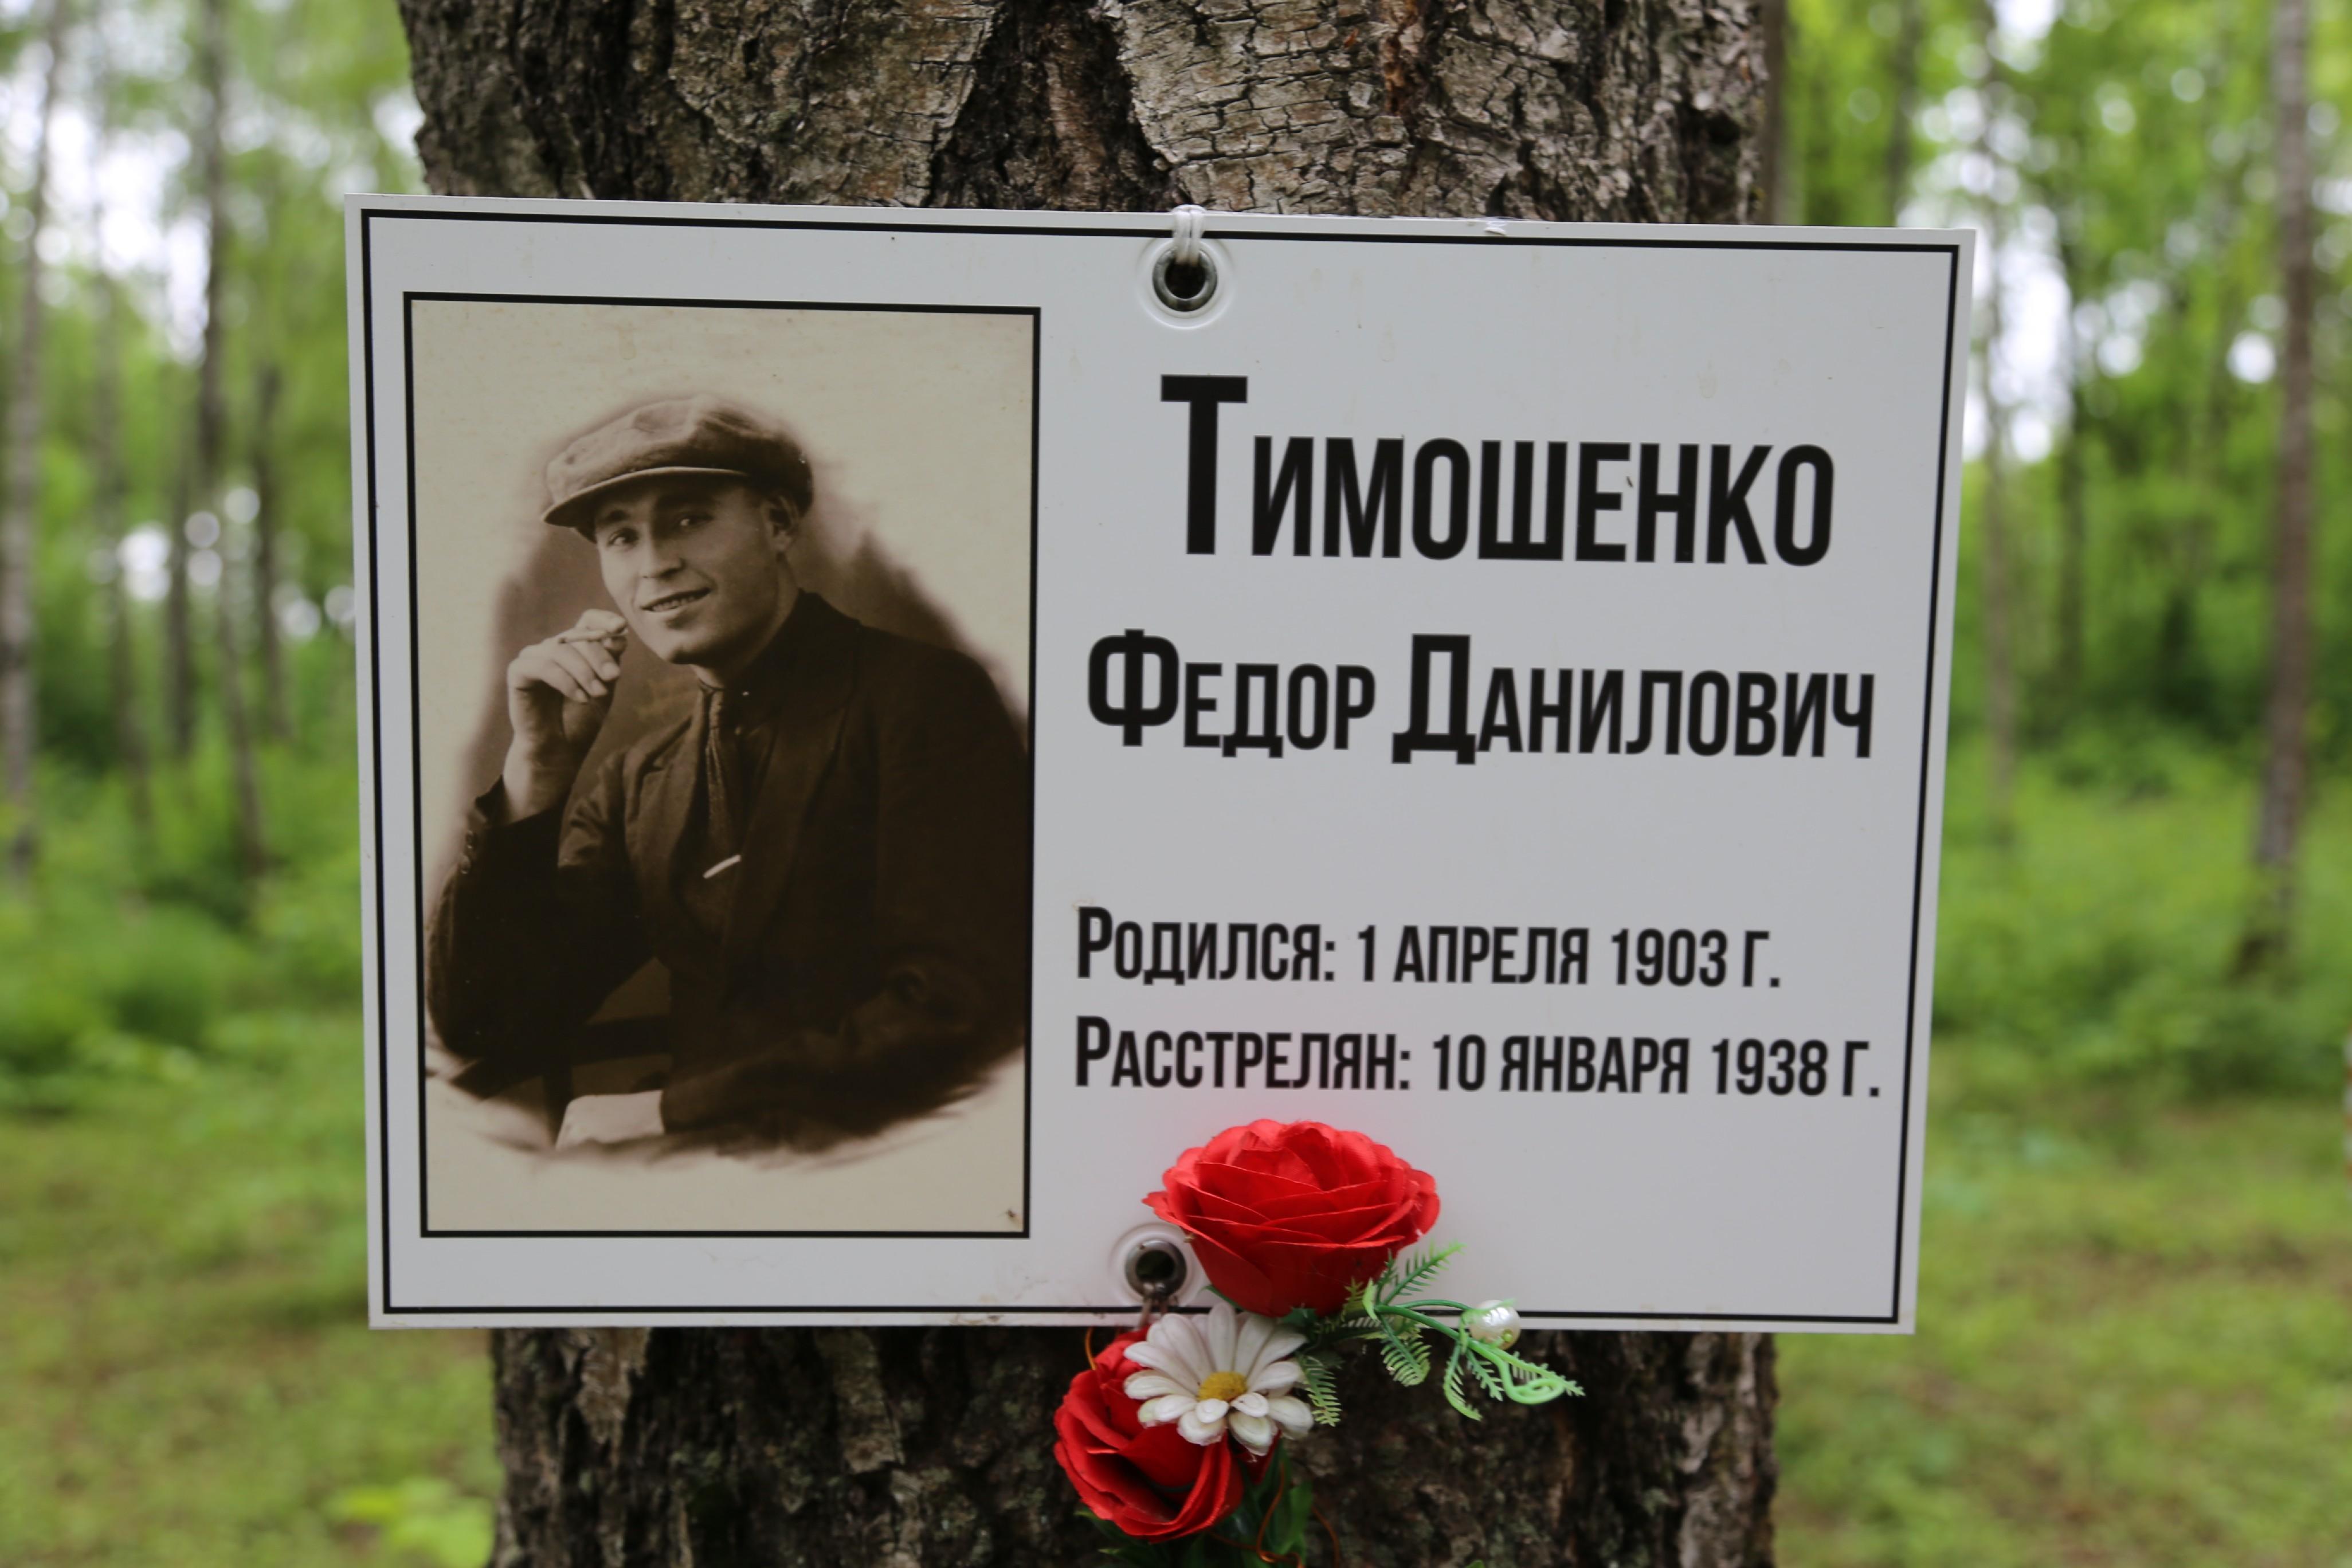 Памятная табличка Ф.Д. Тимошенко. Фото 07.06.2018.